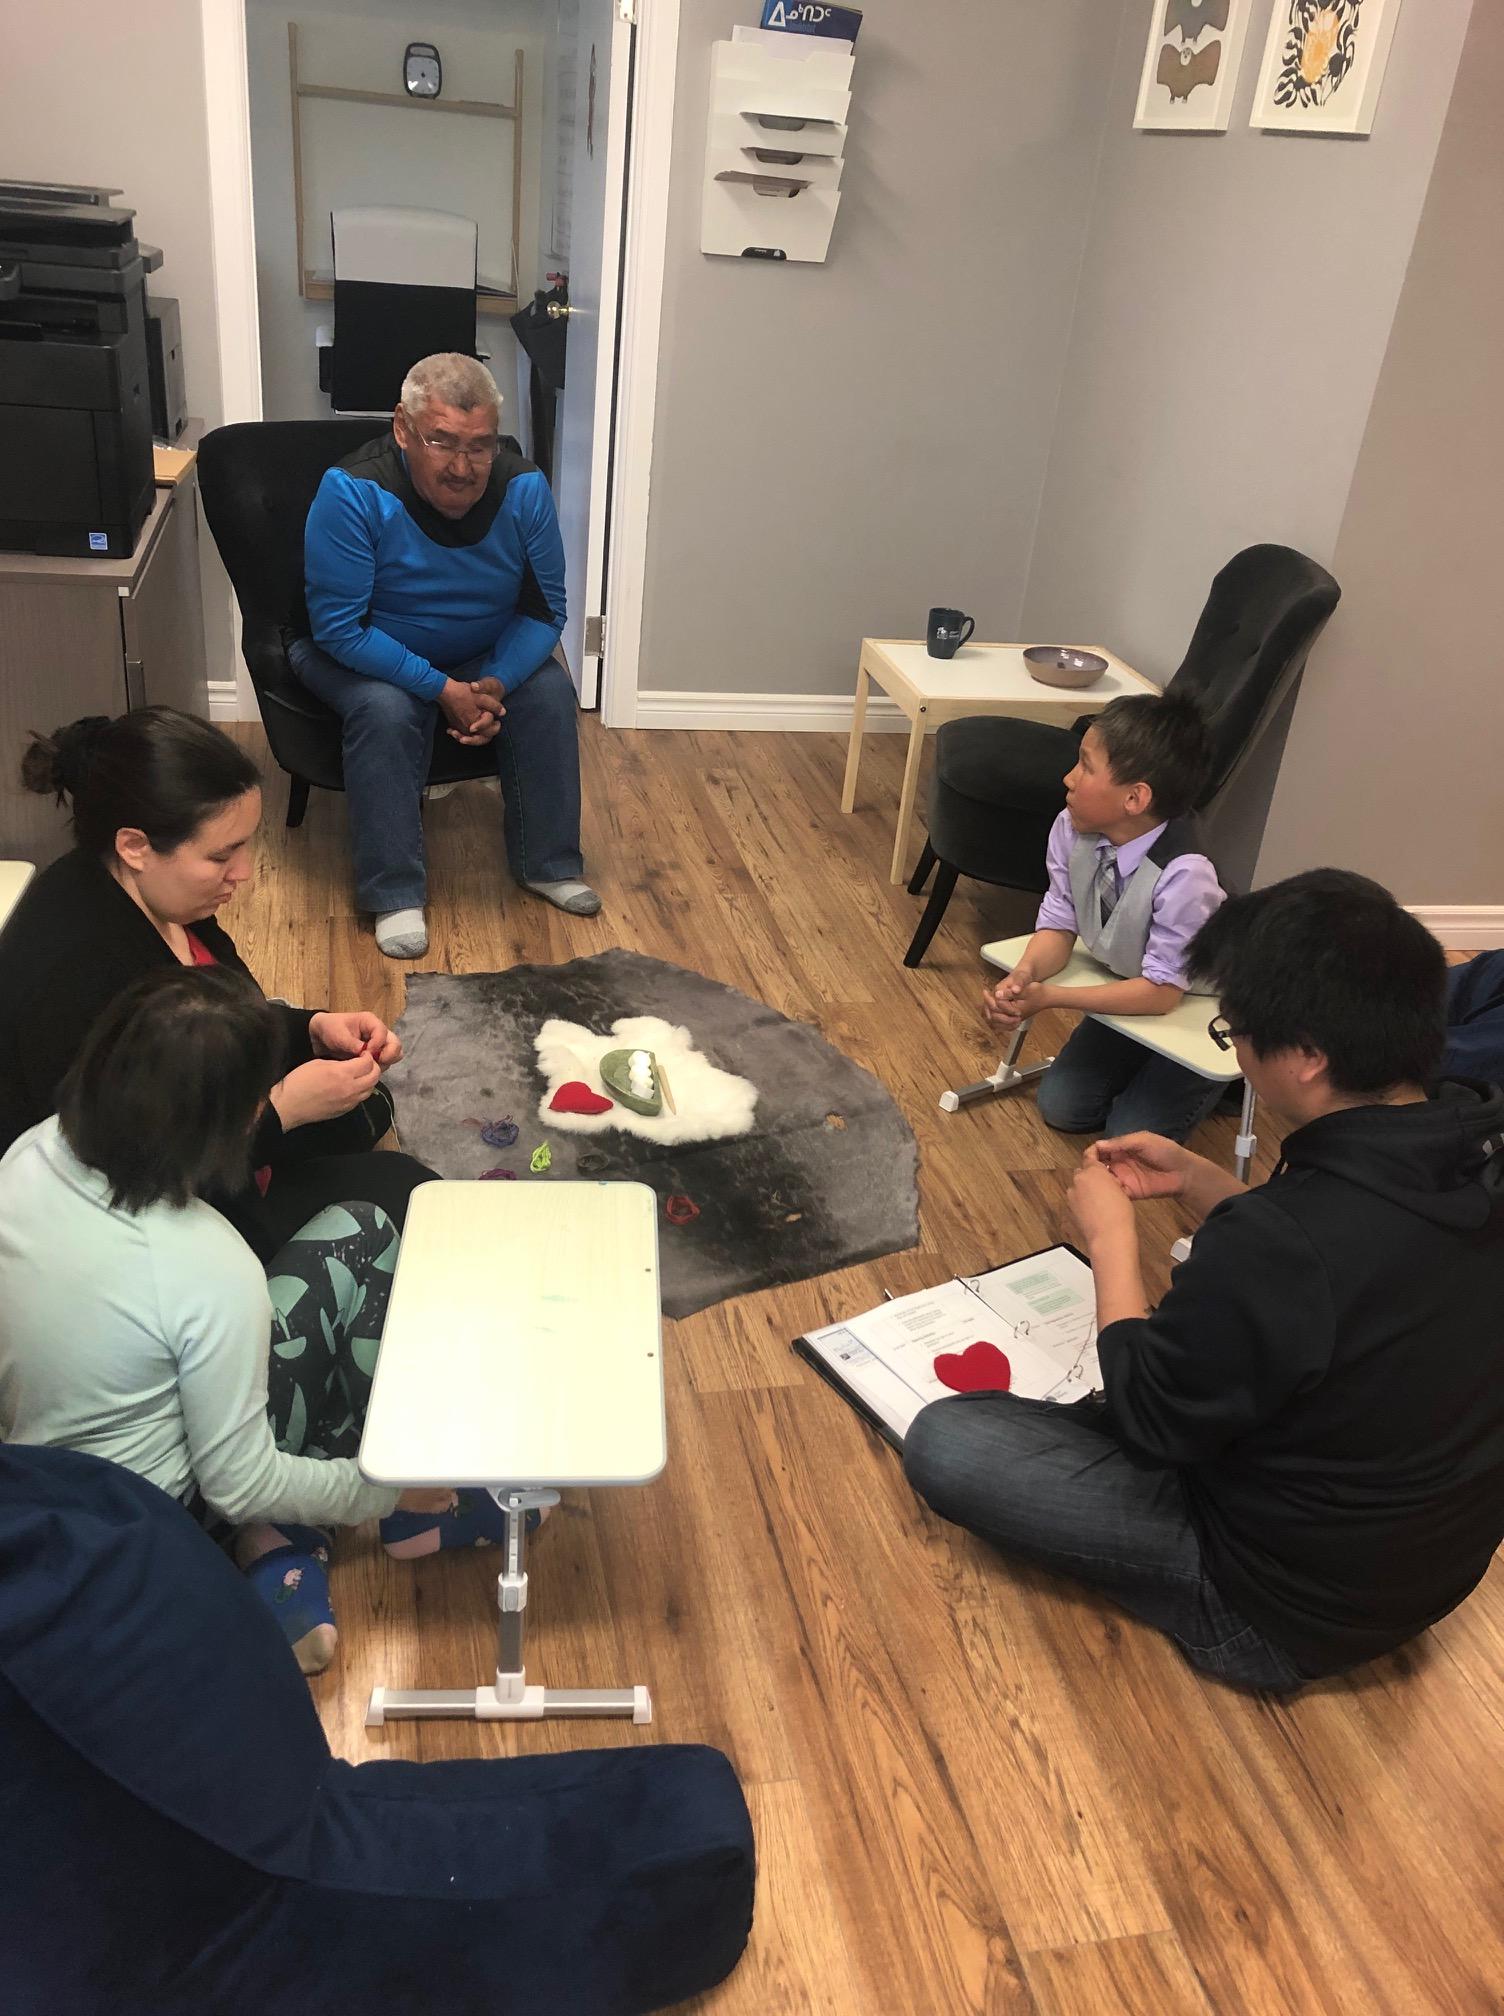 Project aims to unite Nunavut residents affected by FASD | Nunatsiaq News